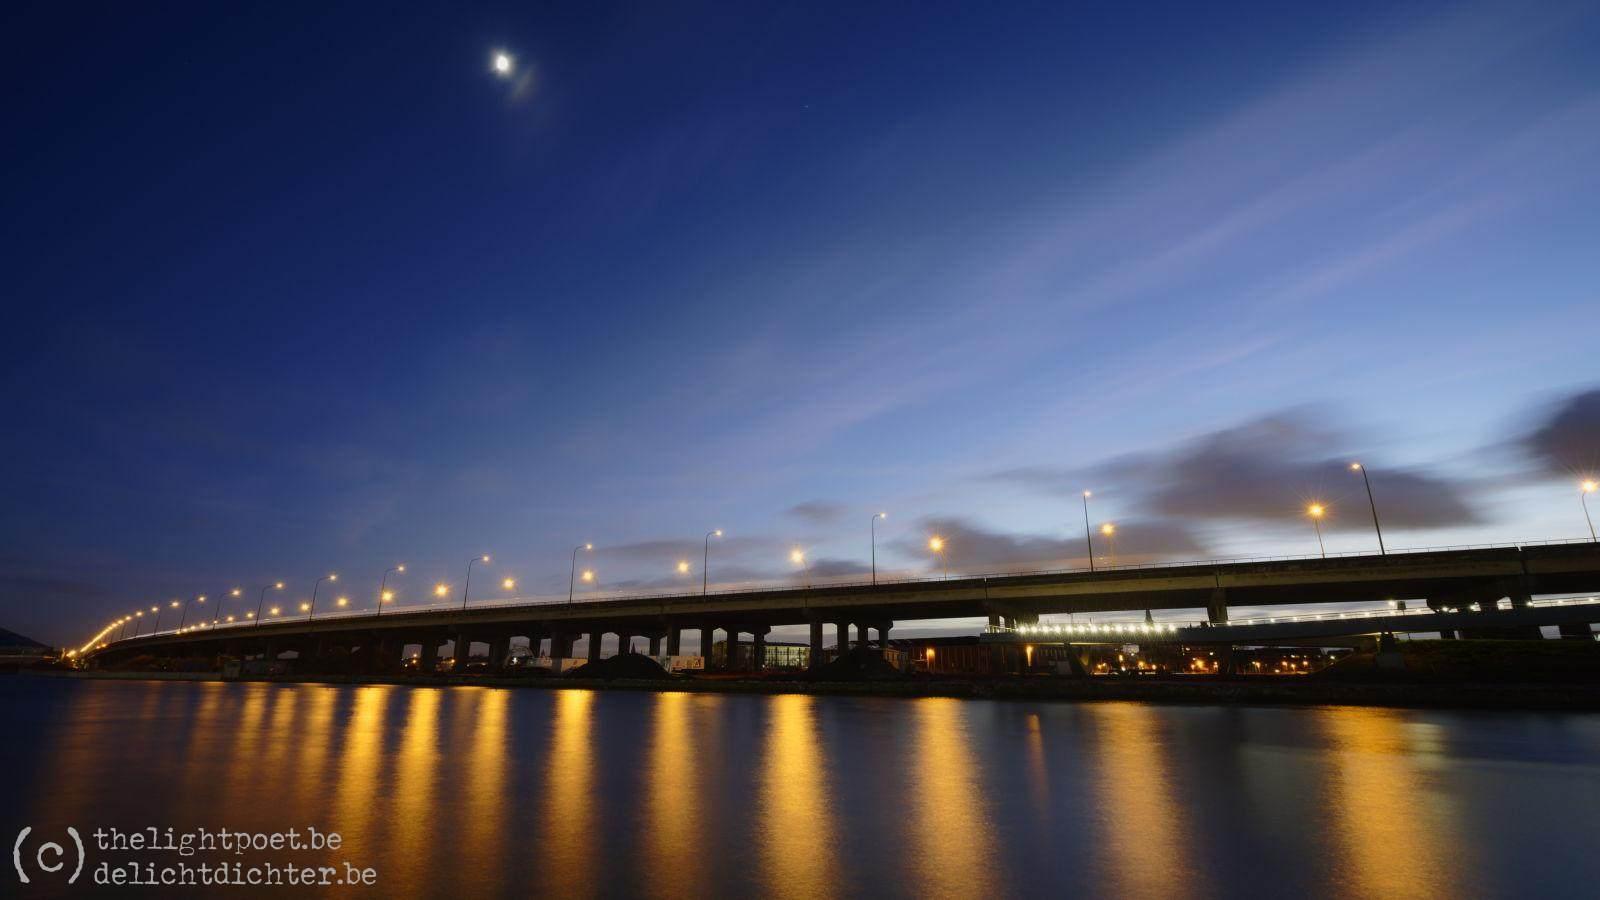 2019_01_Viaduct_20190114_174130_DxO_PL2_1600px_3